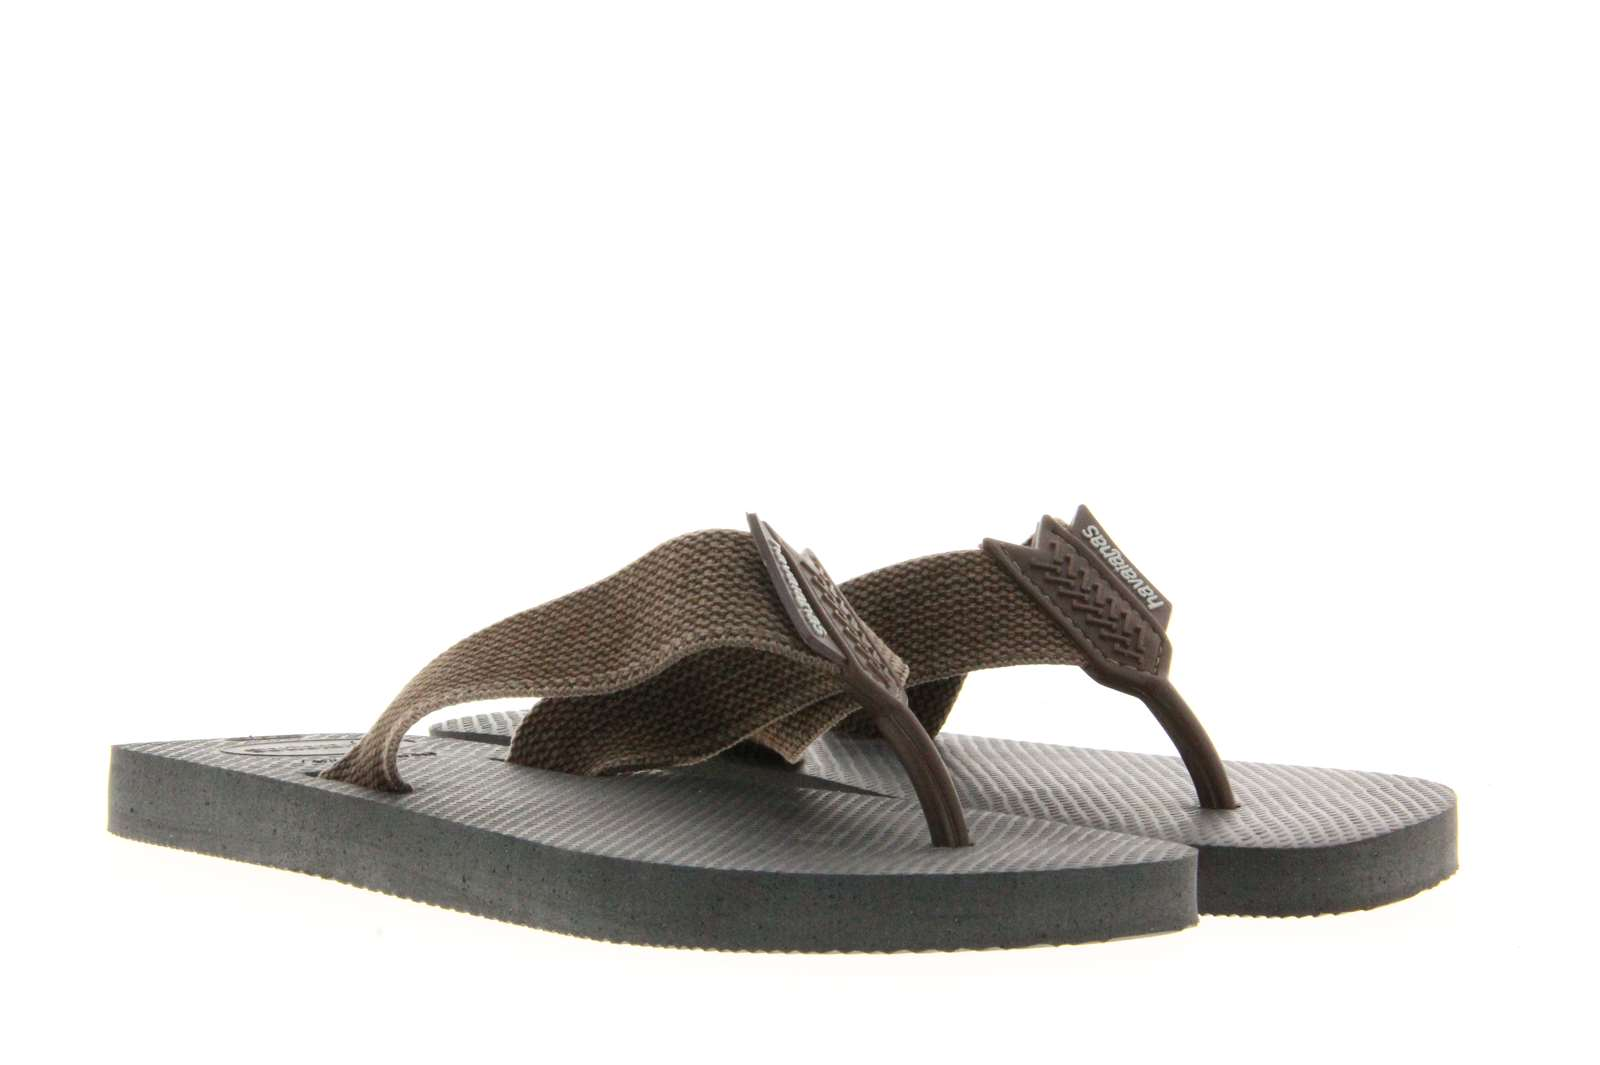 Havaianas toe sandals URBAN BASIC GREY DARK BROWN